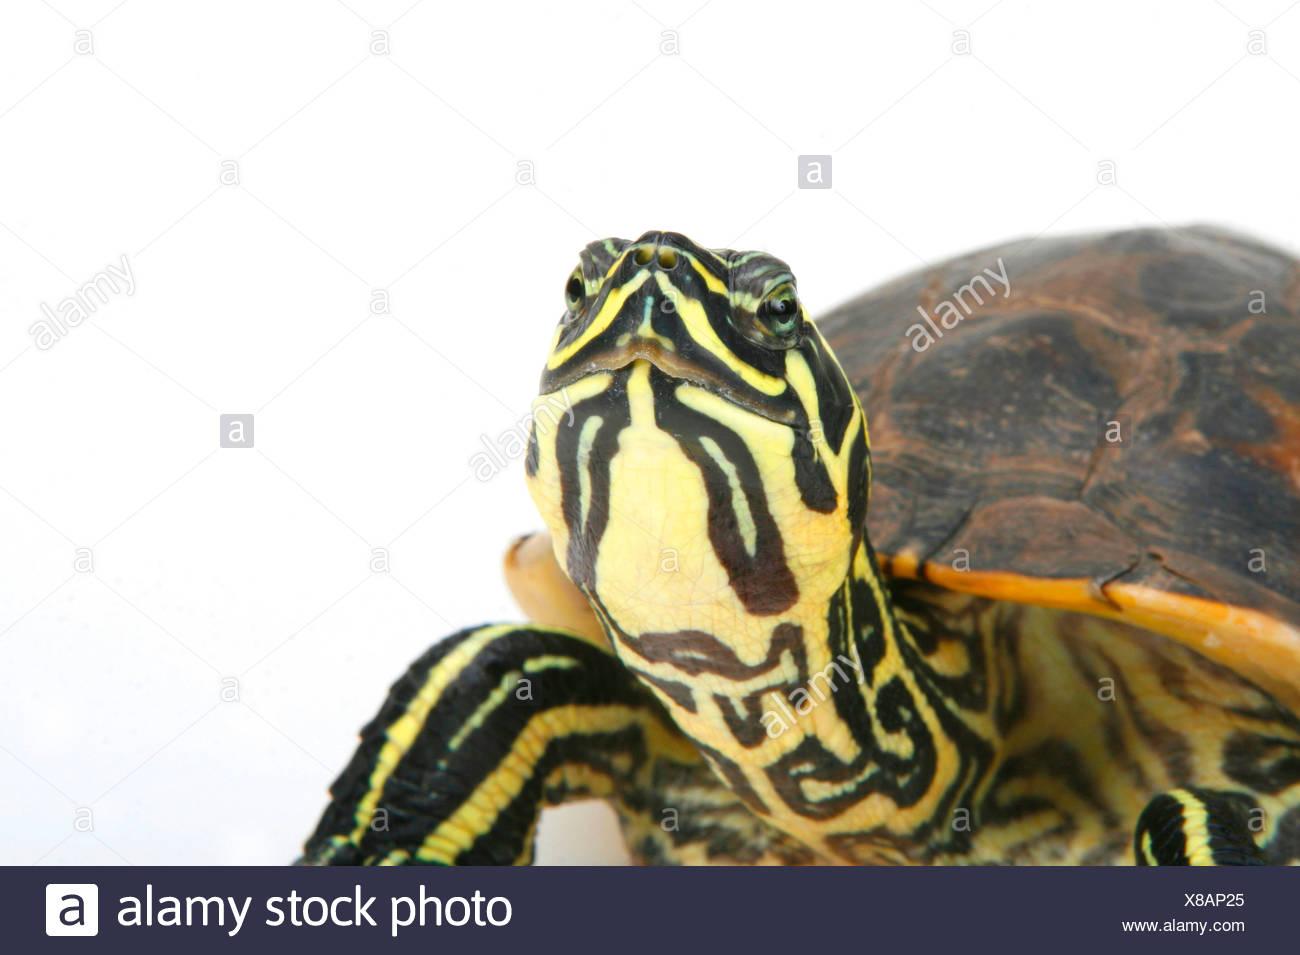 Florida Redbelly Turtle Stock Photo